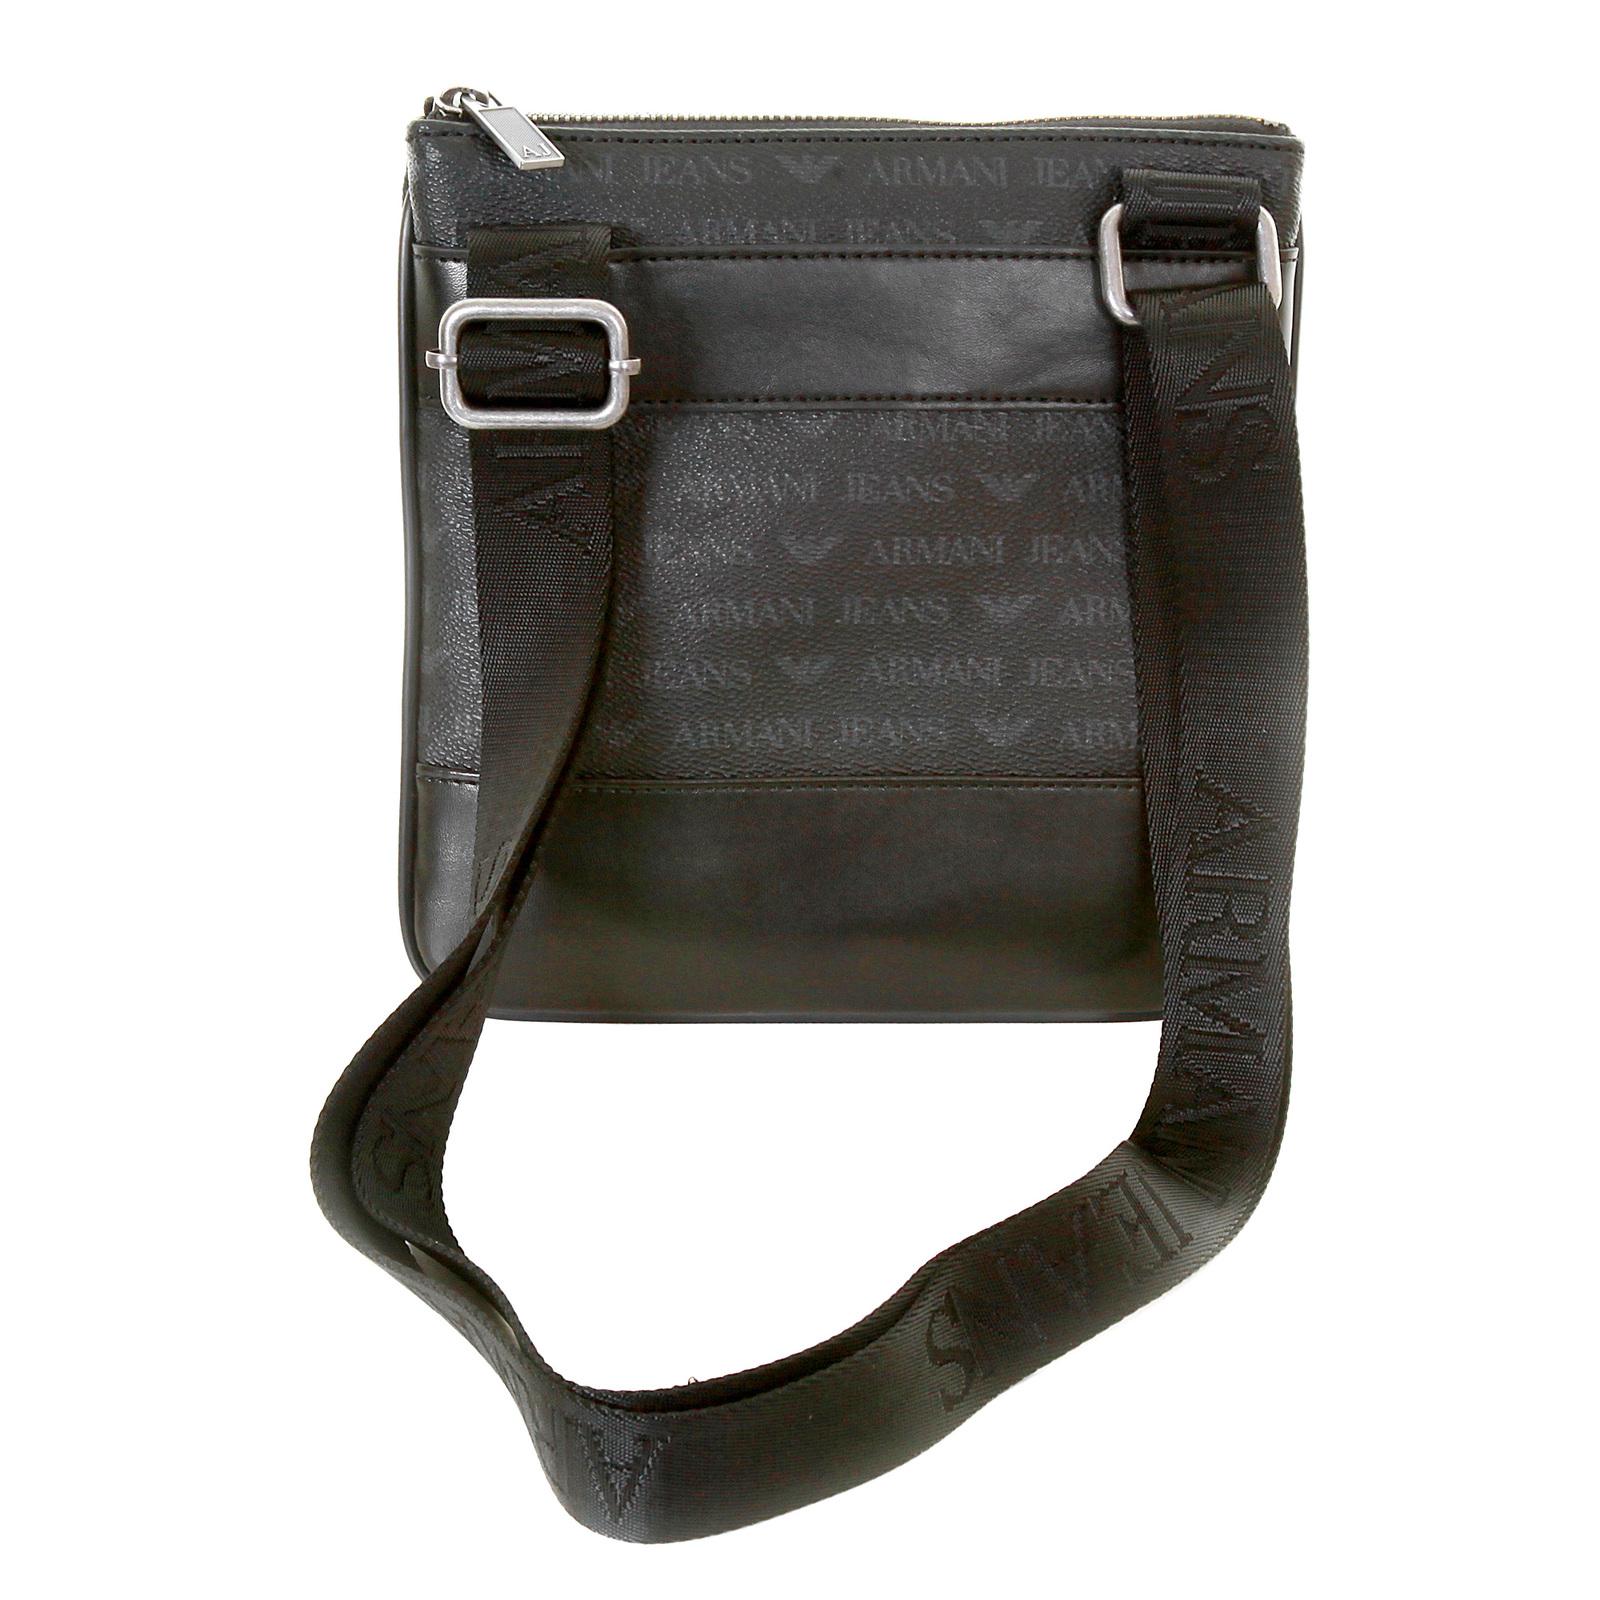 dead3f475deb Armani Jeans mens black logo small messenger bag AJM2473 at Togged ...